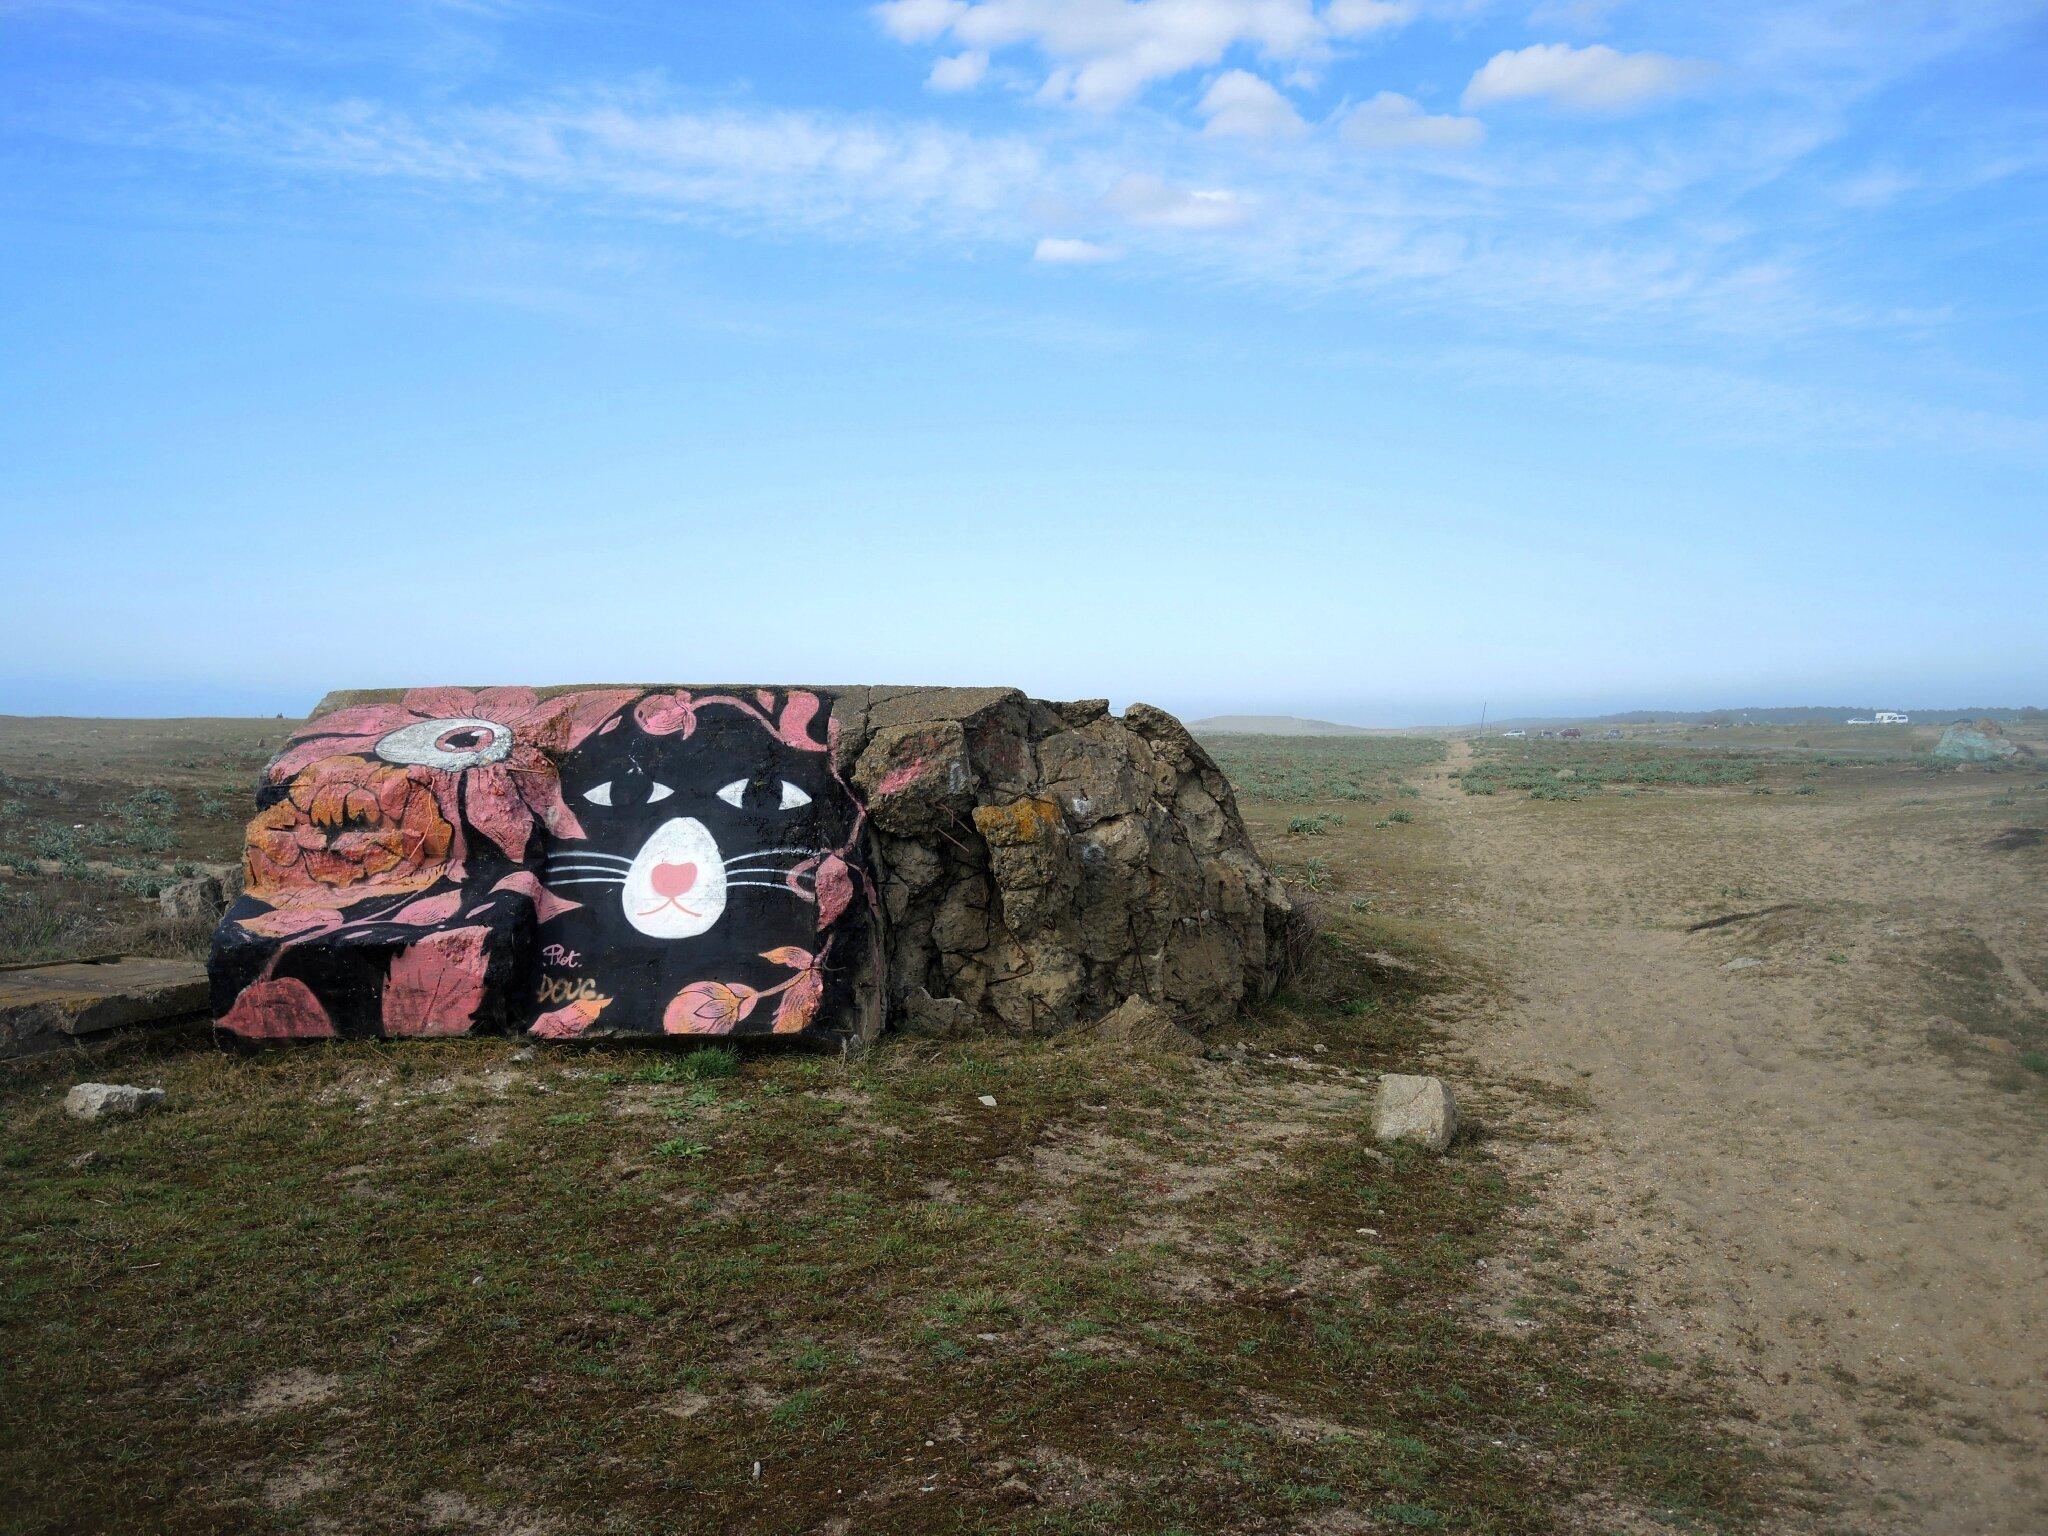 Tarnos, champ des blockhaus, p'tite mimine (40)